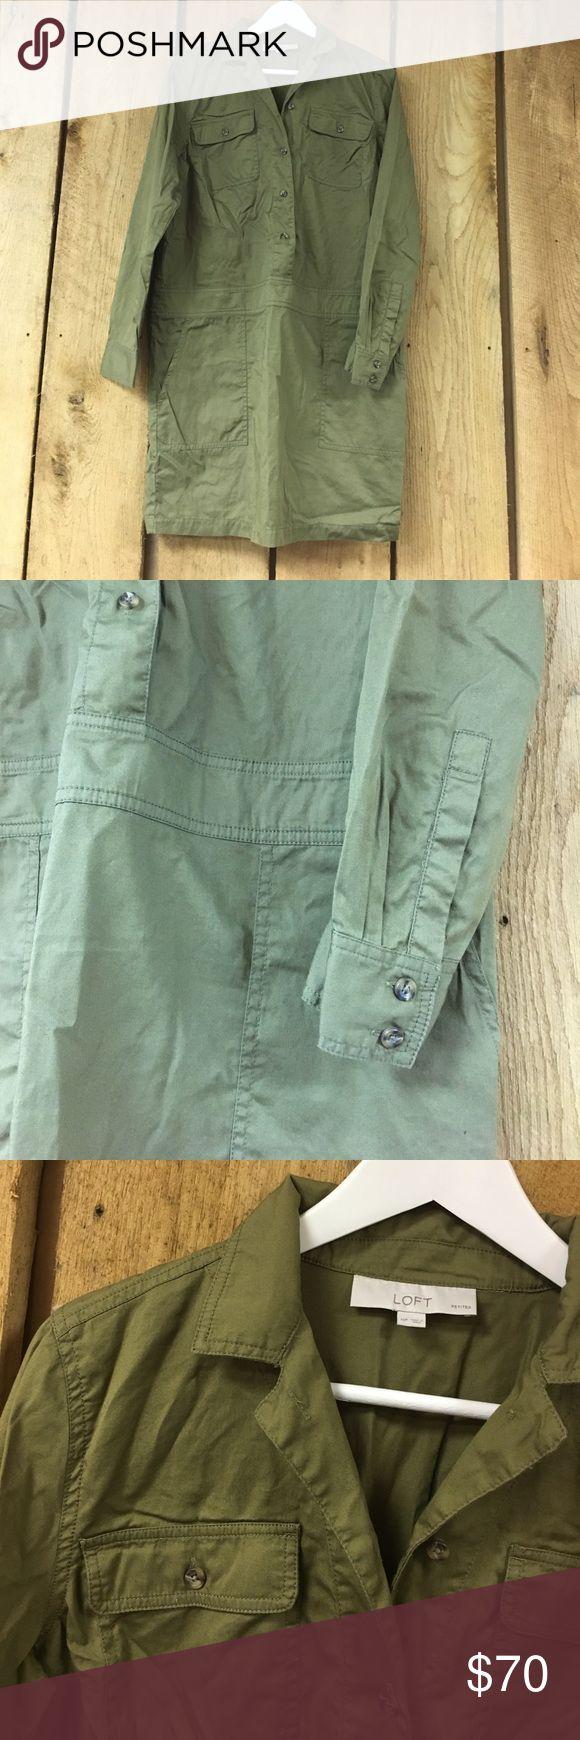 LOFT Petite shirt dress Olive green - 100% cotton - nice light material for spring - excellent condition LOFT Dresses Long Sleeve